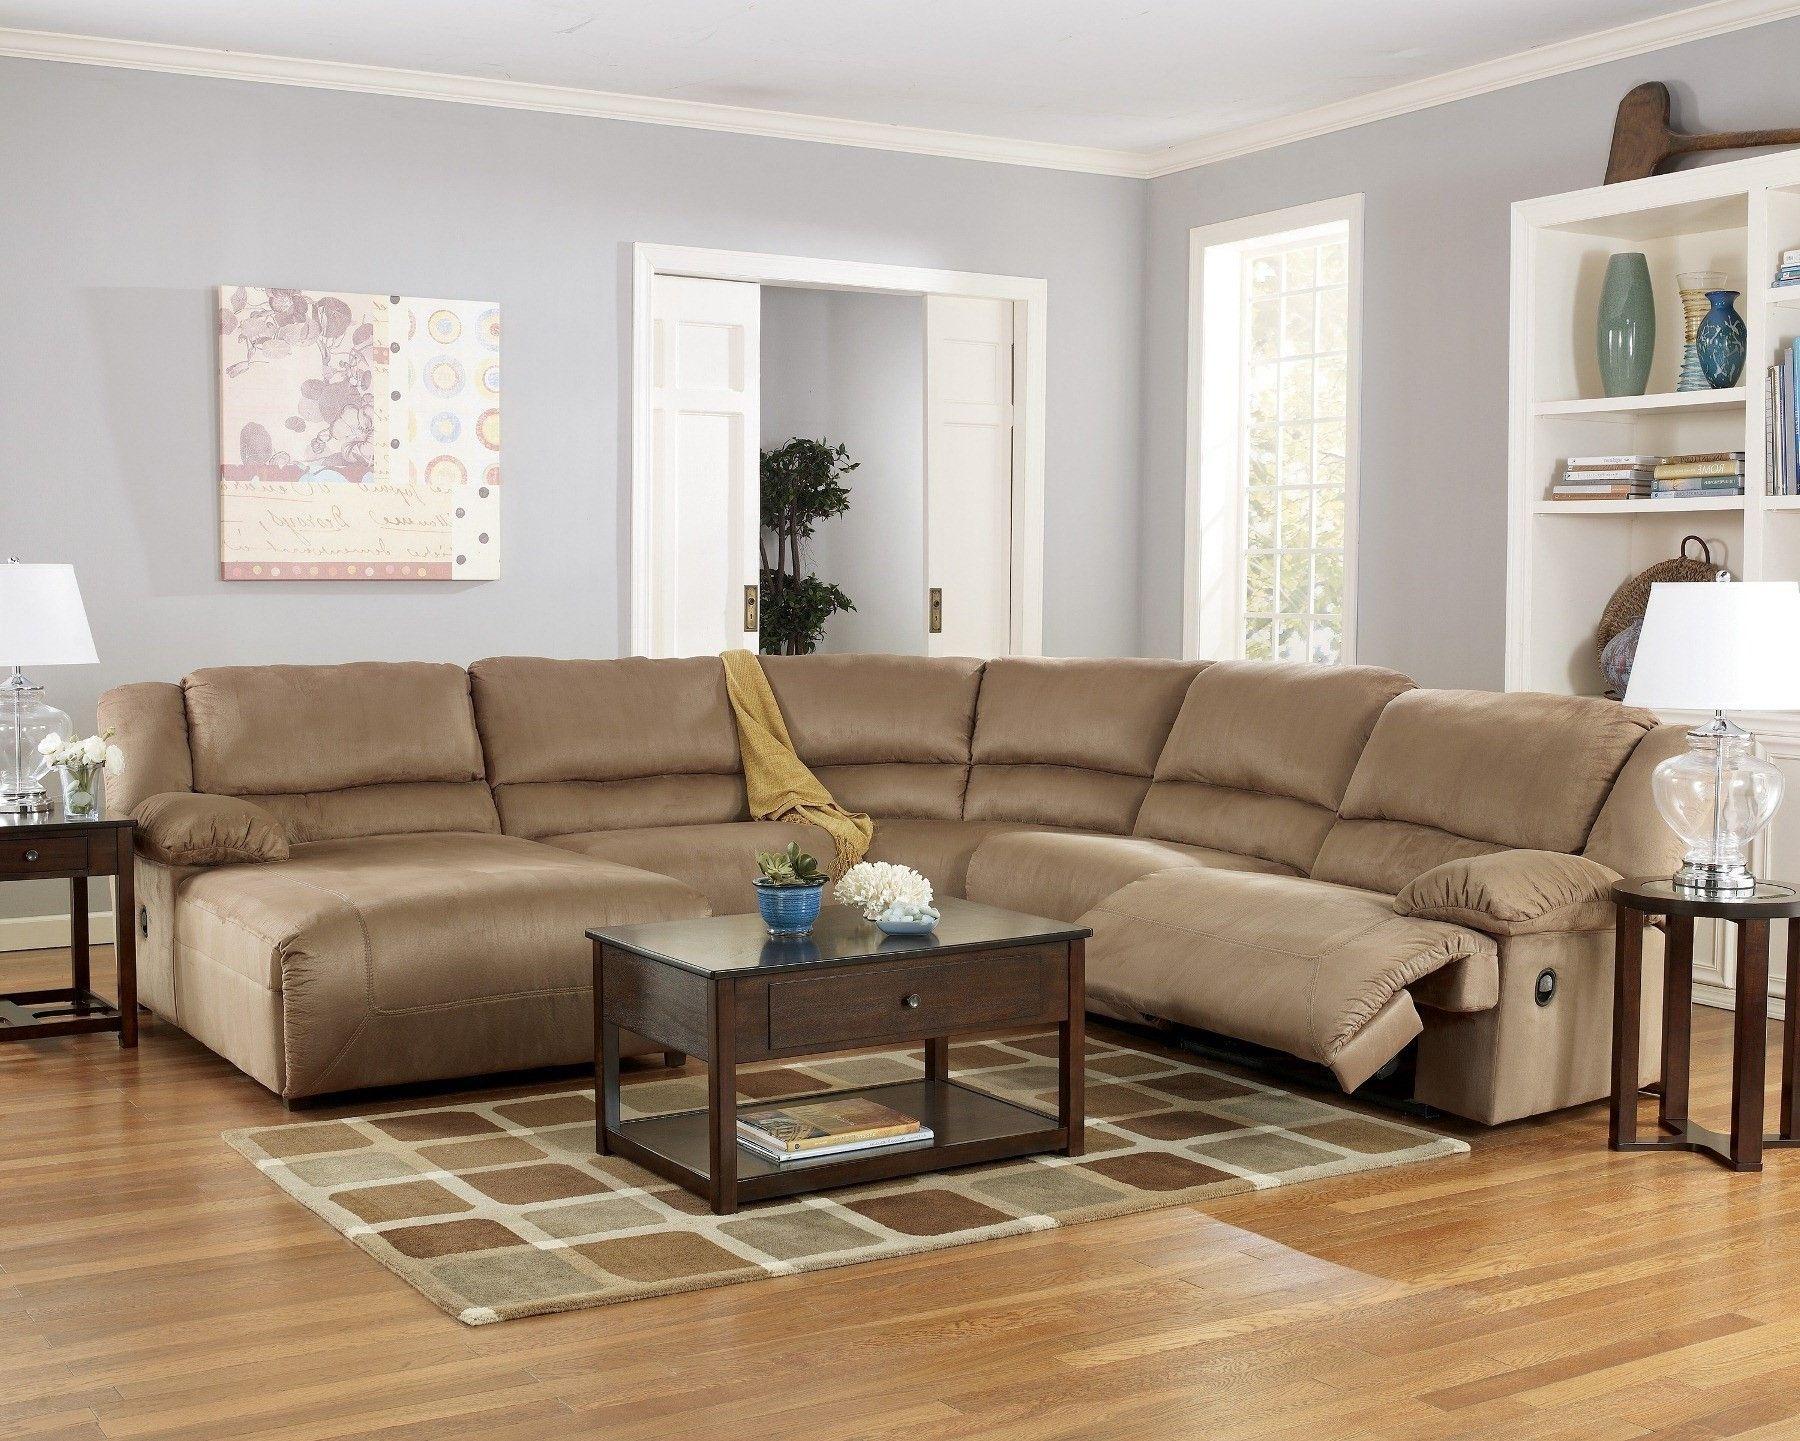 ashley furniture morandi mocha sofa lv hogan taraba home review